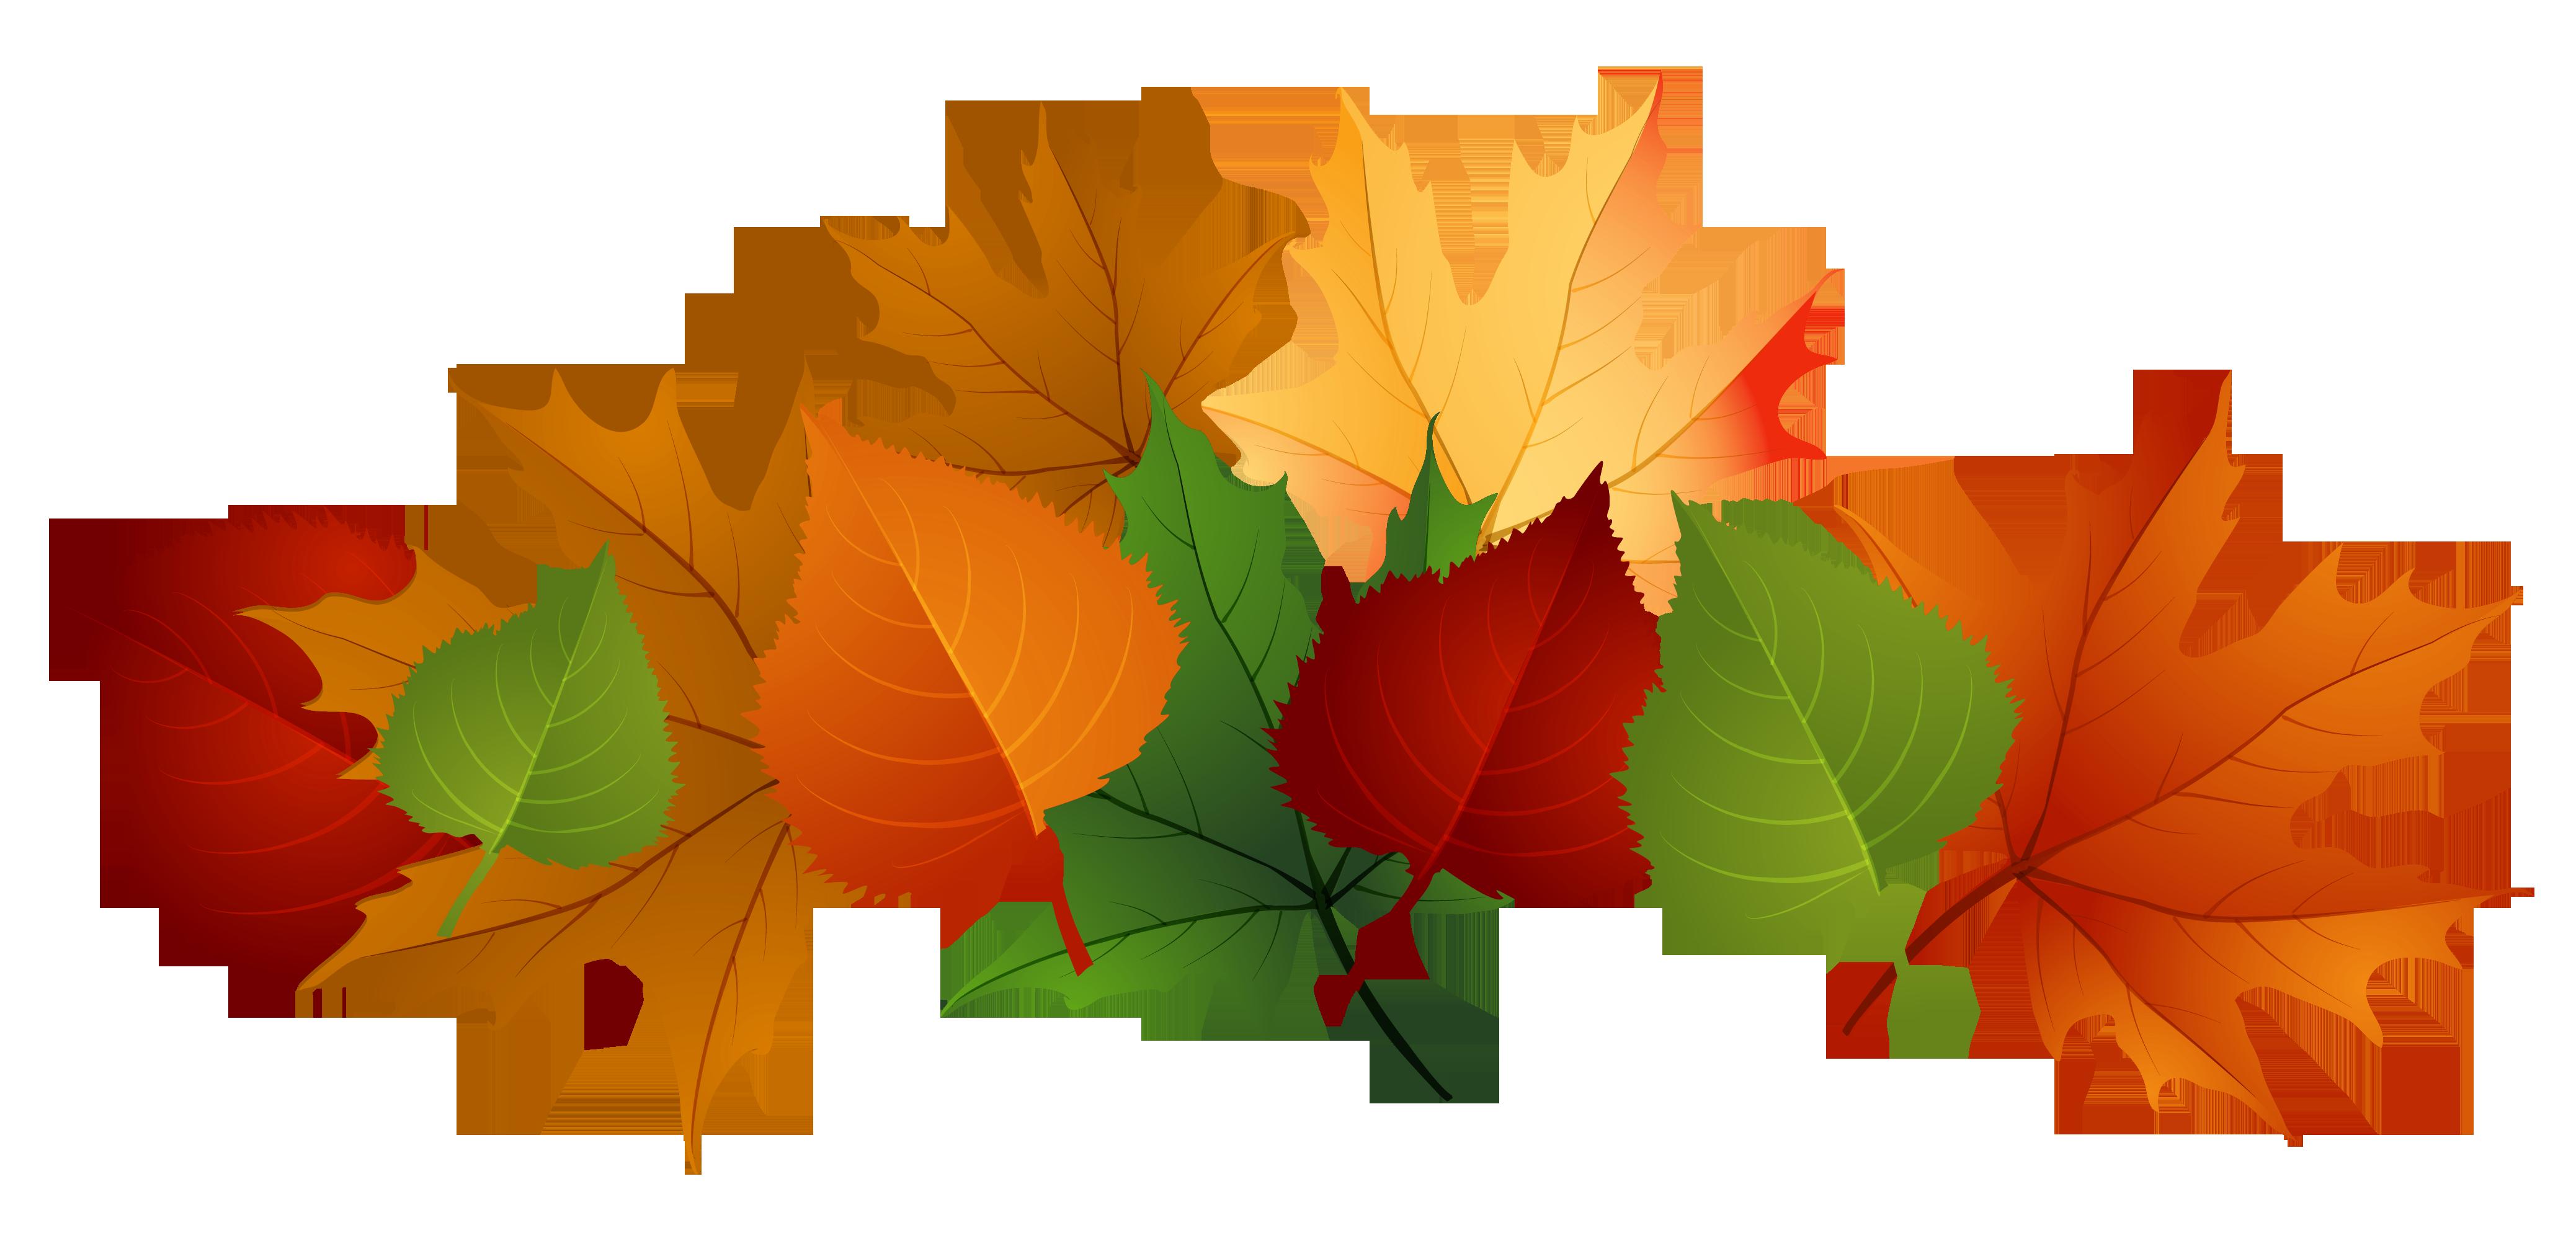 Autumn Leaves Pile Clip Art Fall Leaves -Autumn Leaves Pile Clip Art Fall Leaves Png Picture-1